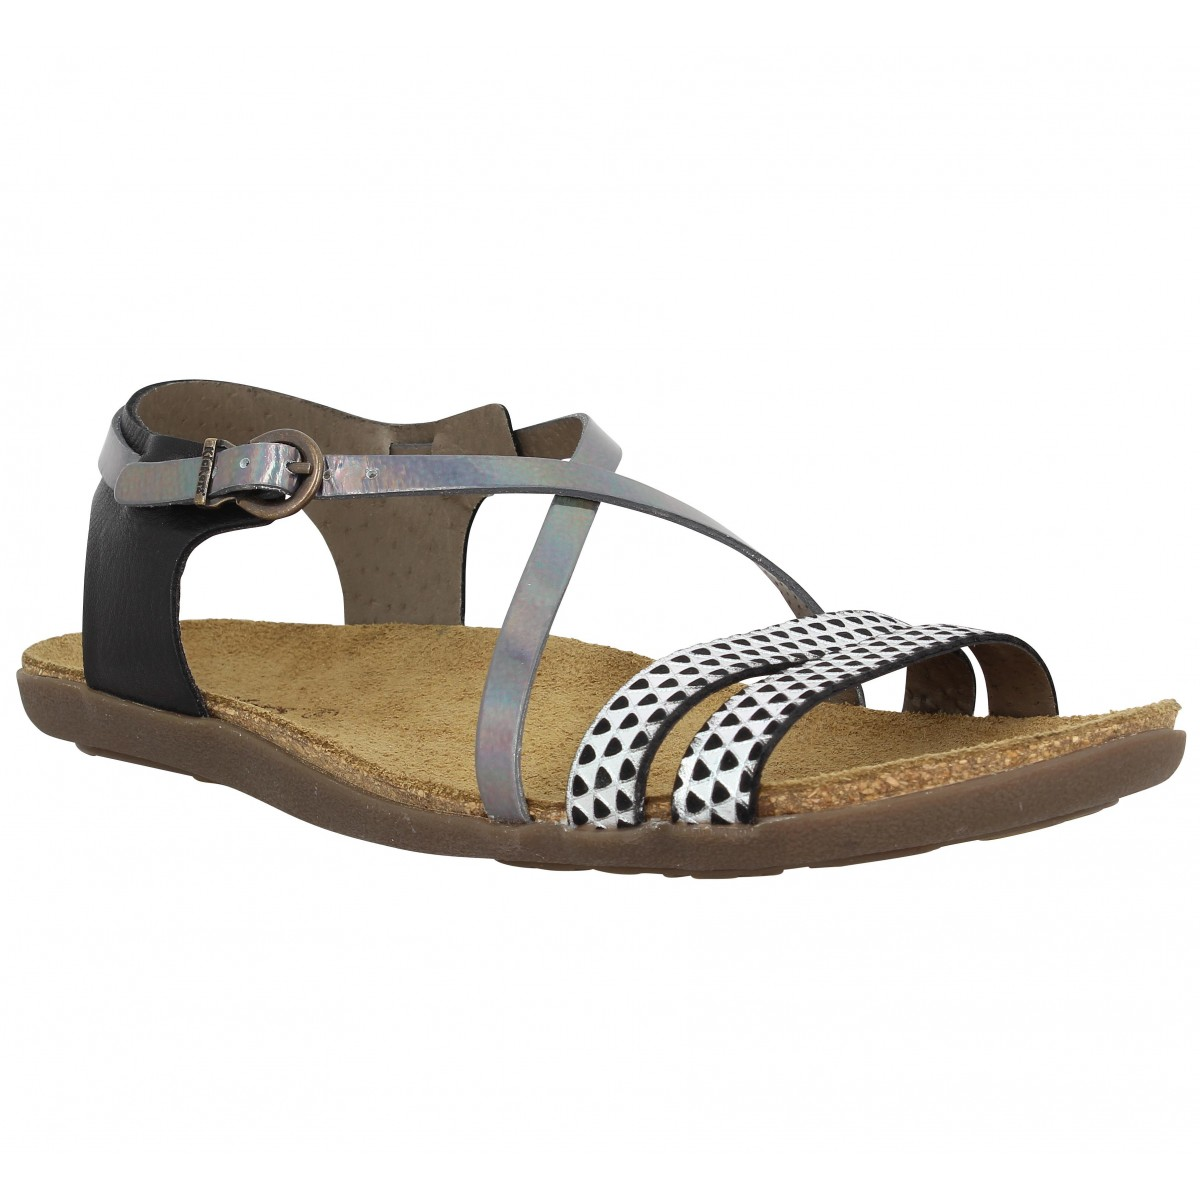 146125a84ef968 Kickers atomium cuir femme noir femme | Fanny chaussures